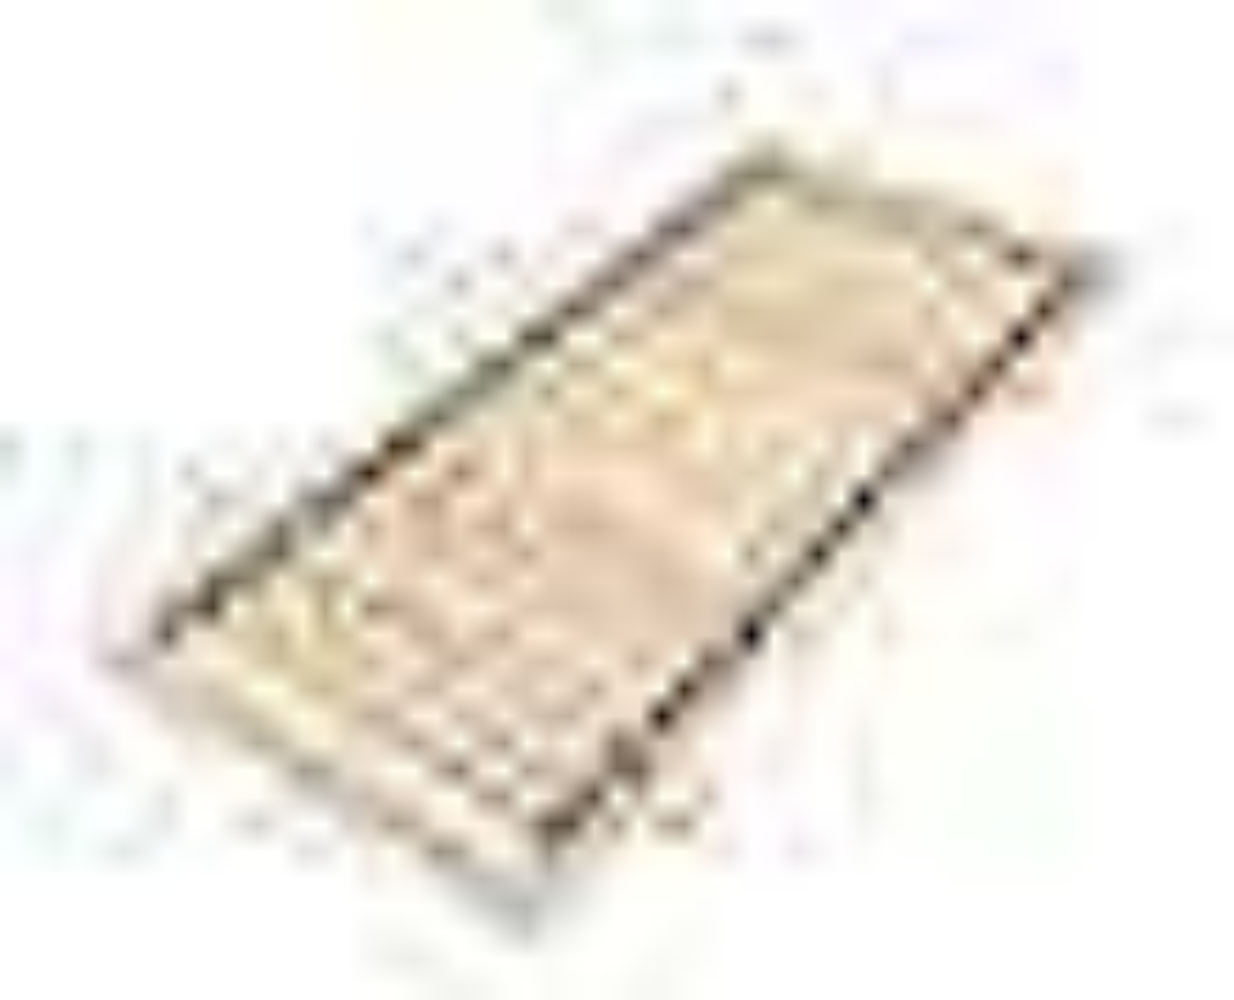 Potah na polštář Curem Original Pillow - 60 x 30 x 13 cm - Curem